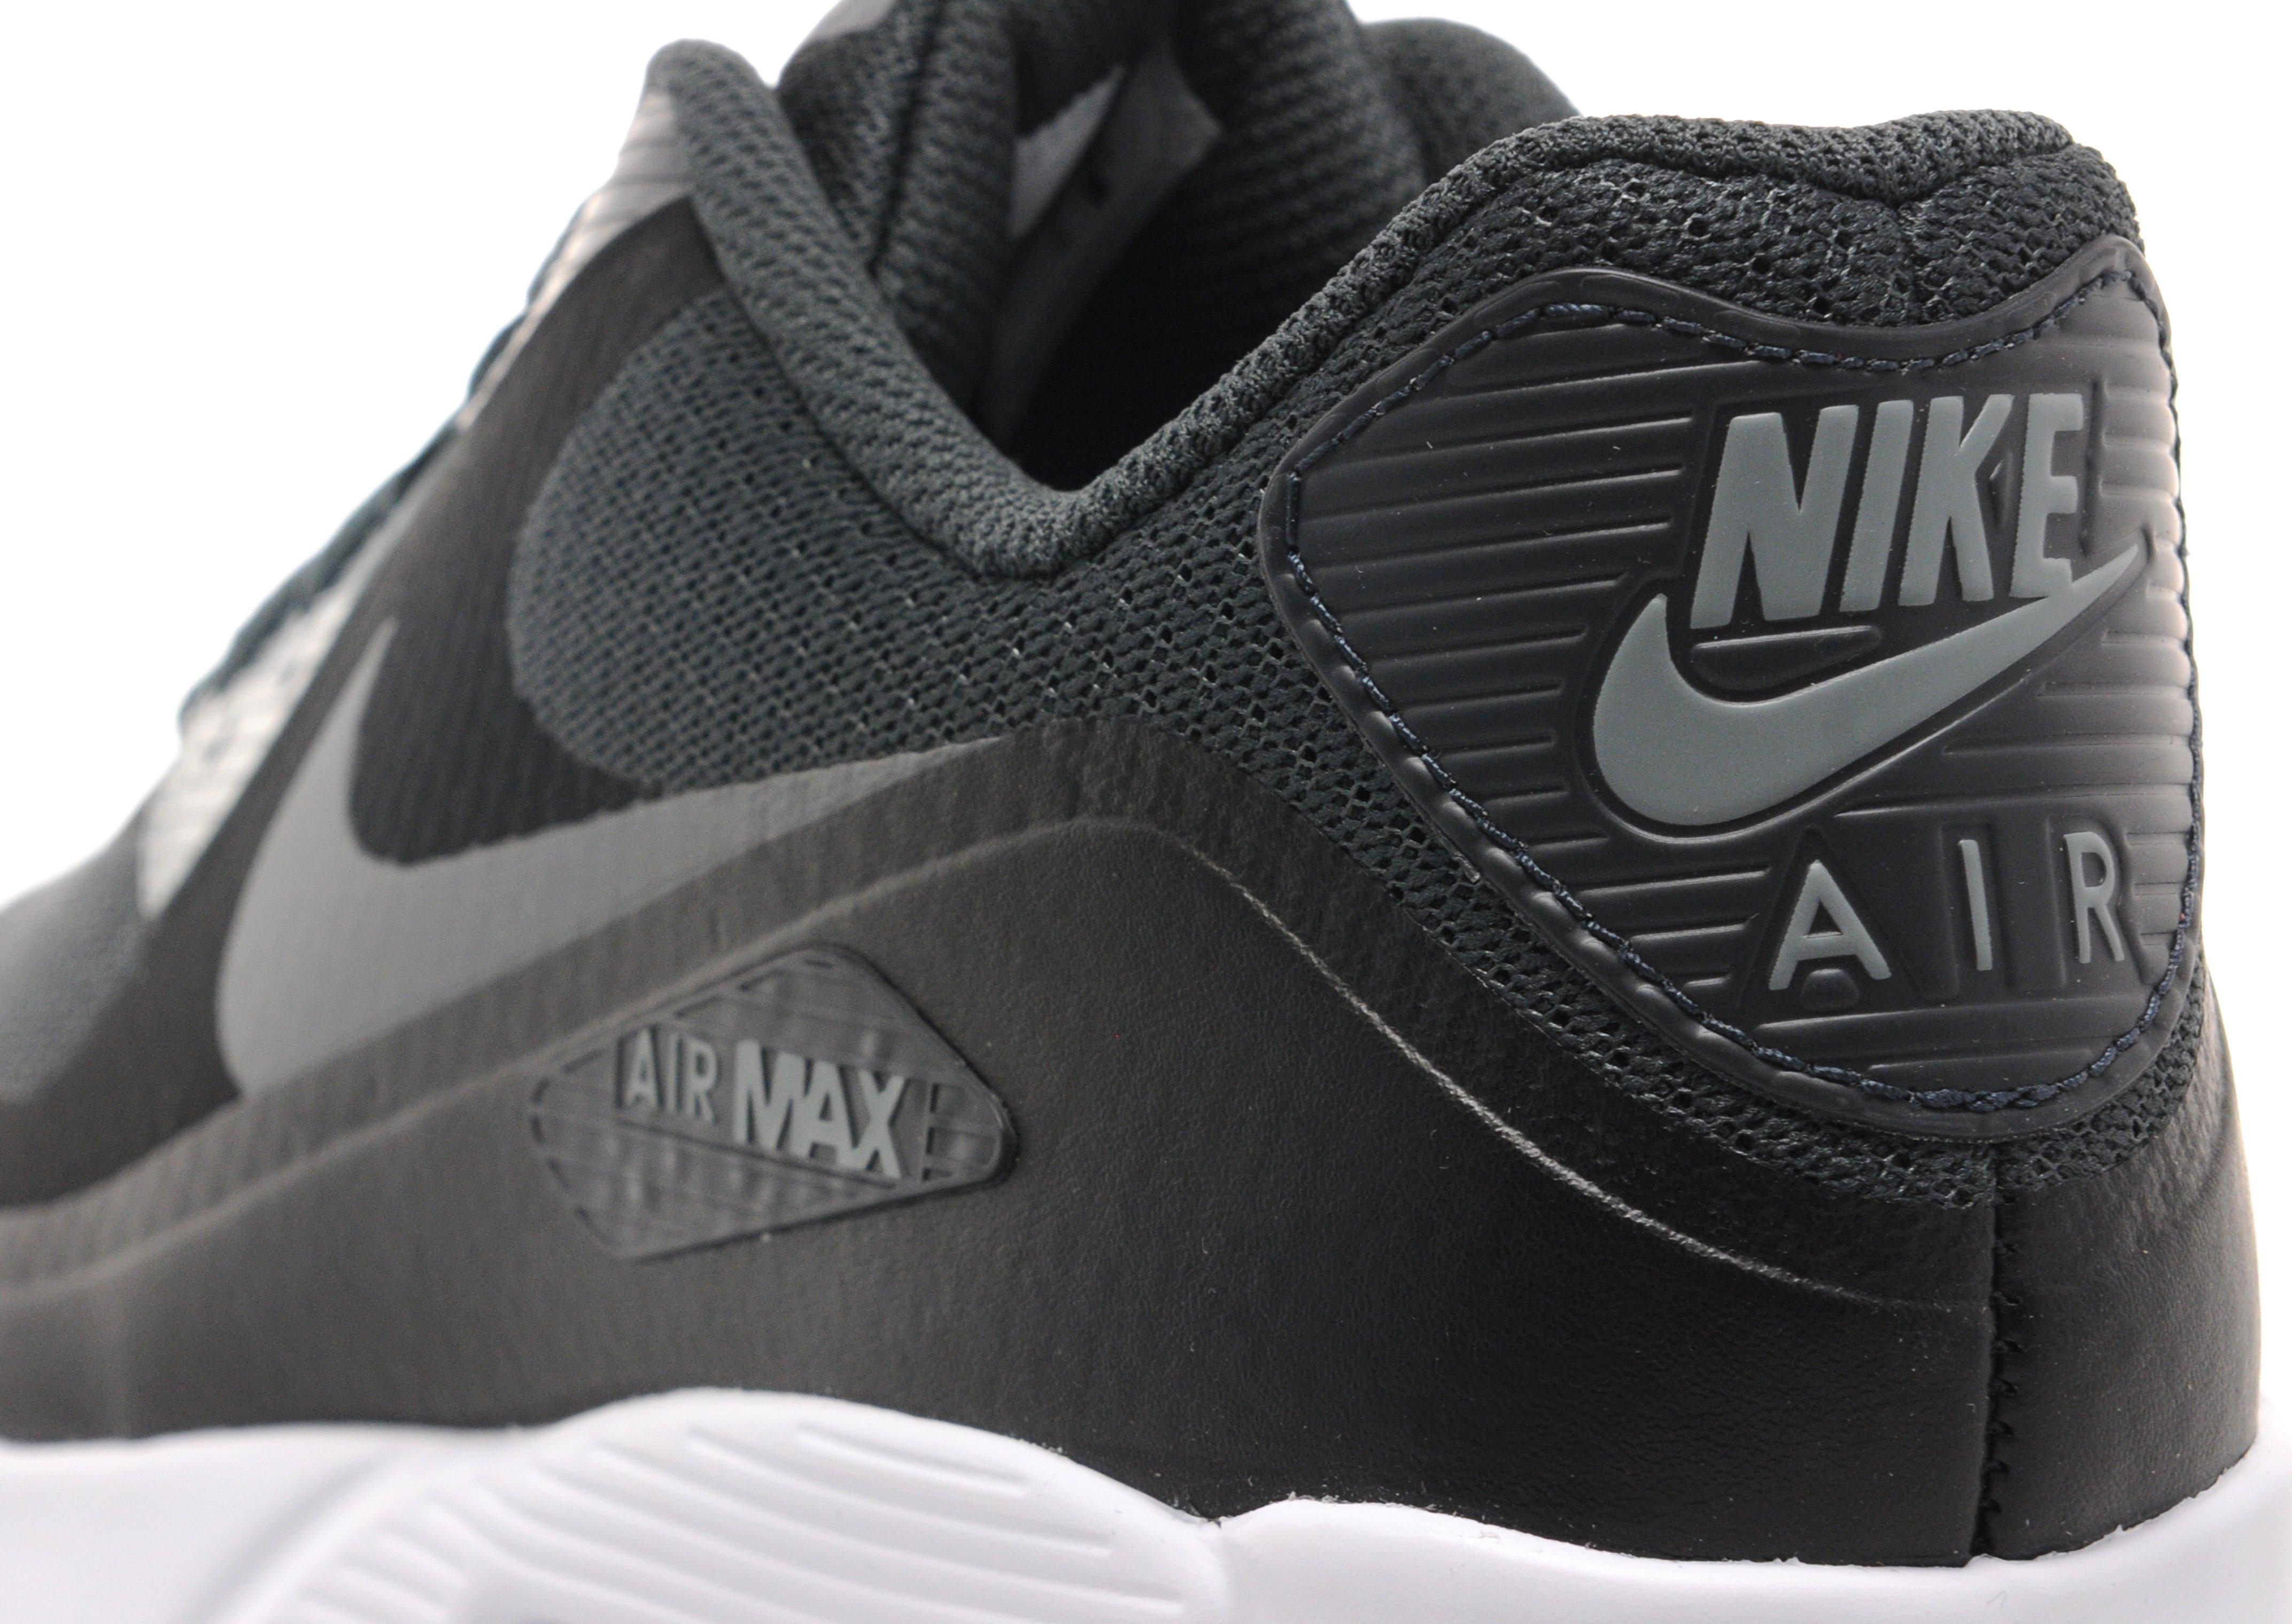 low priced 3596b 66e21 Nike Air Max 90 De Ultra Esencial 20 Jd Sports Uk envío libre ...